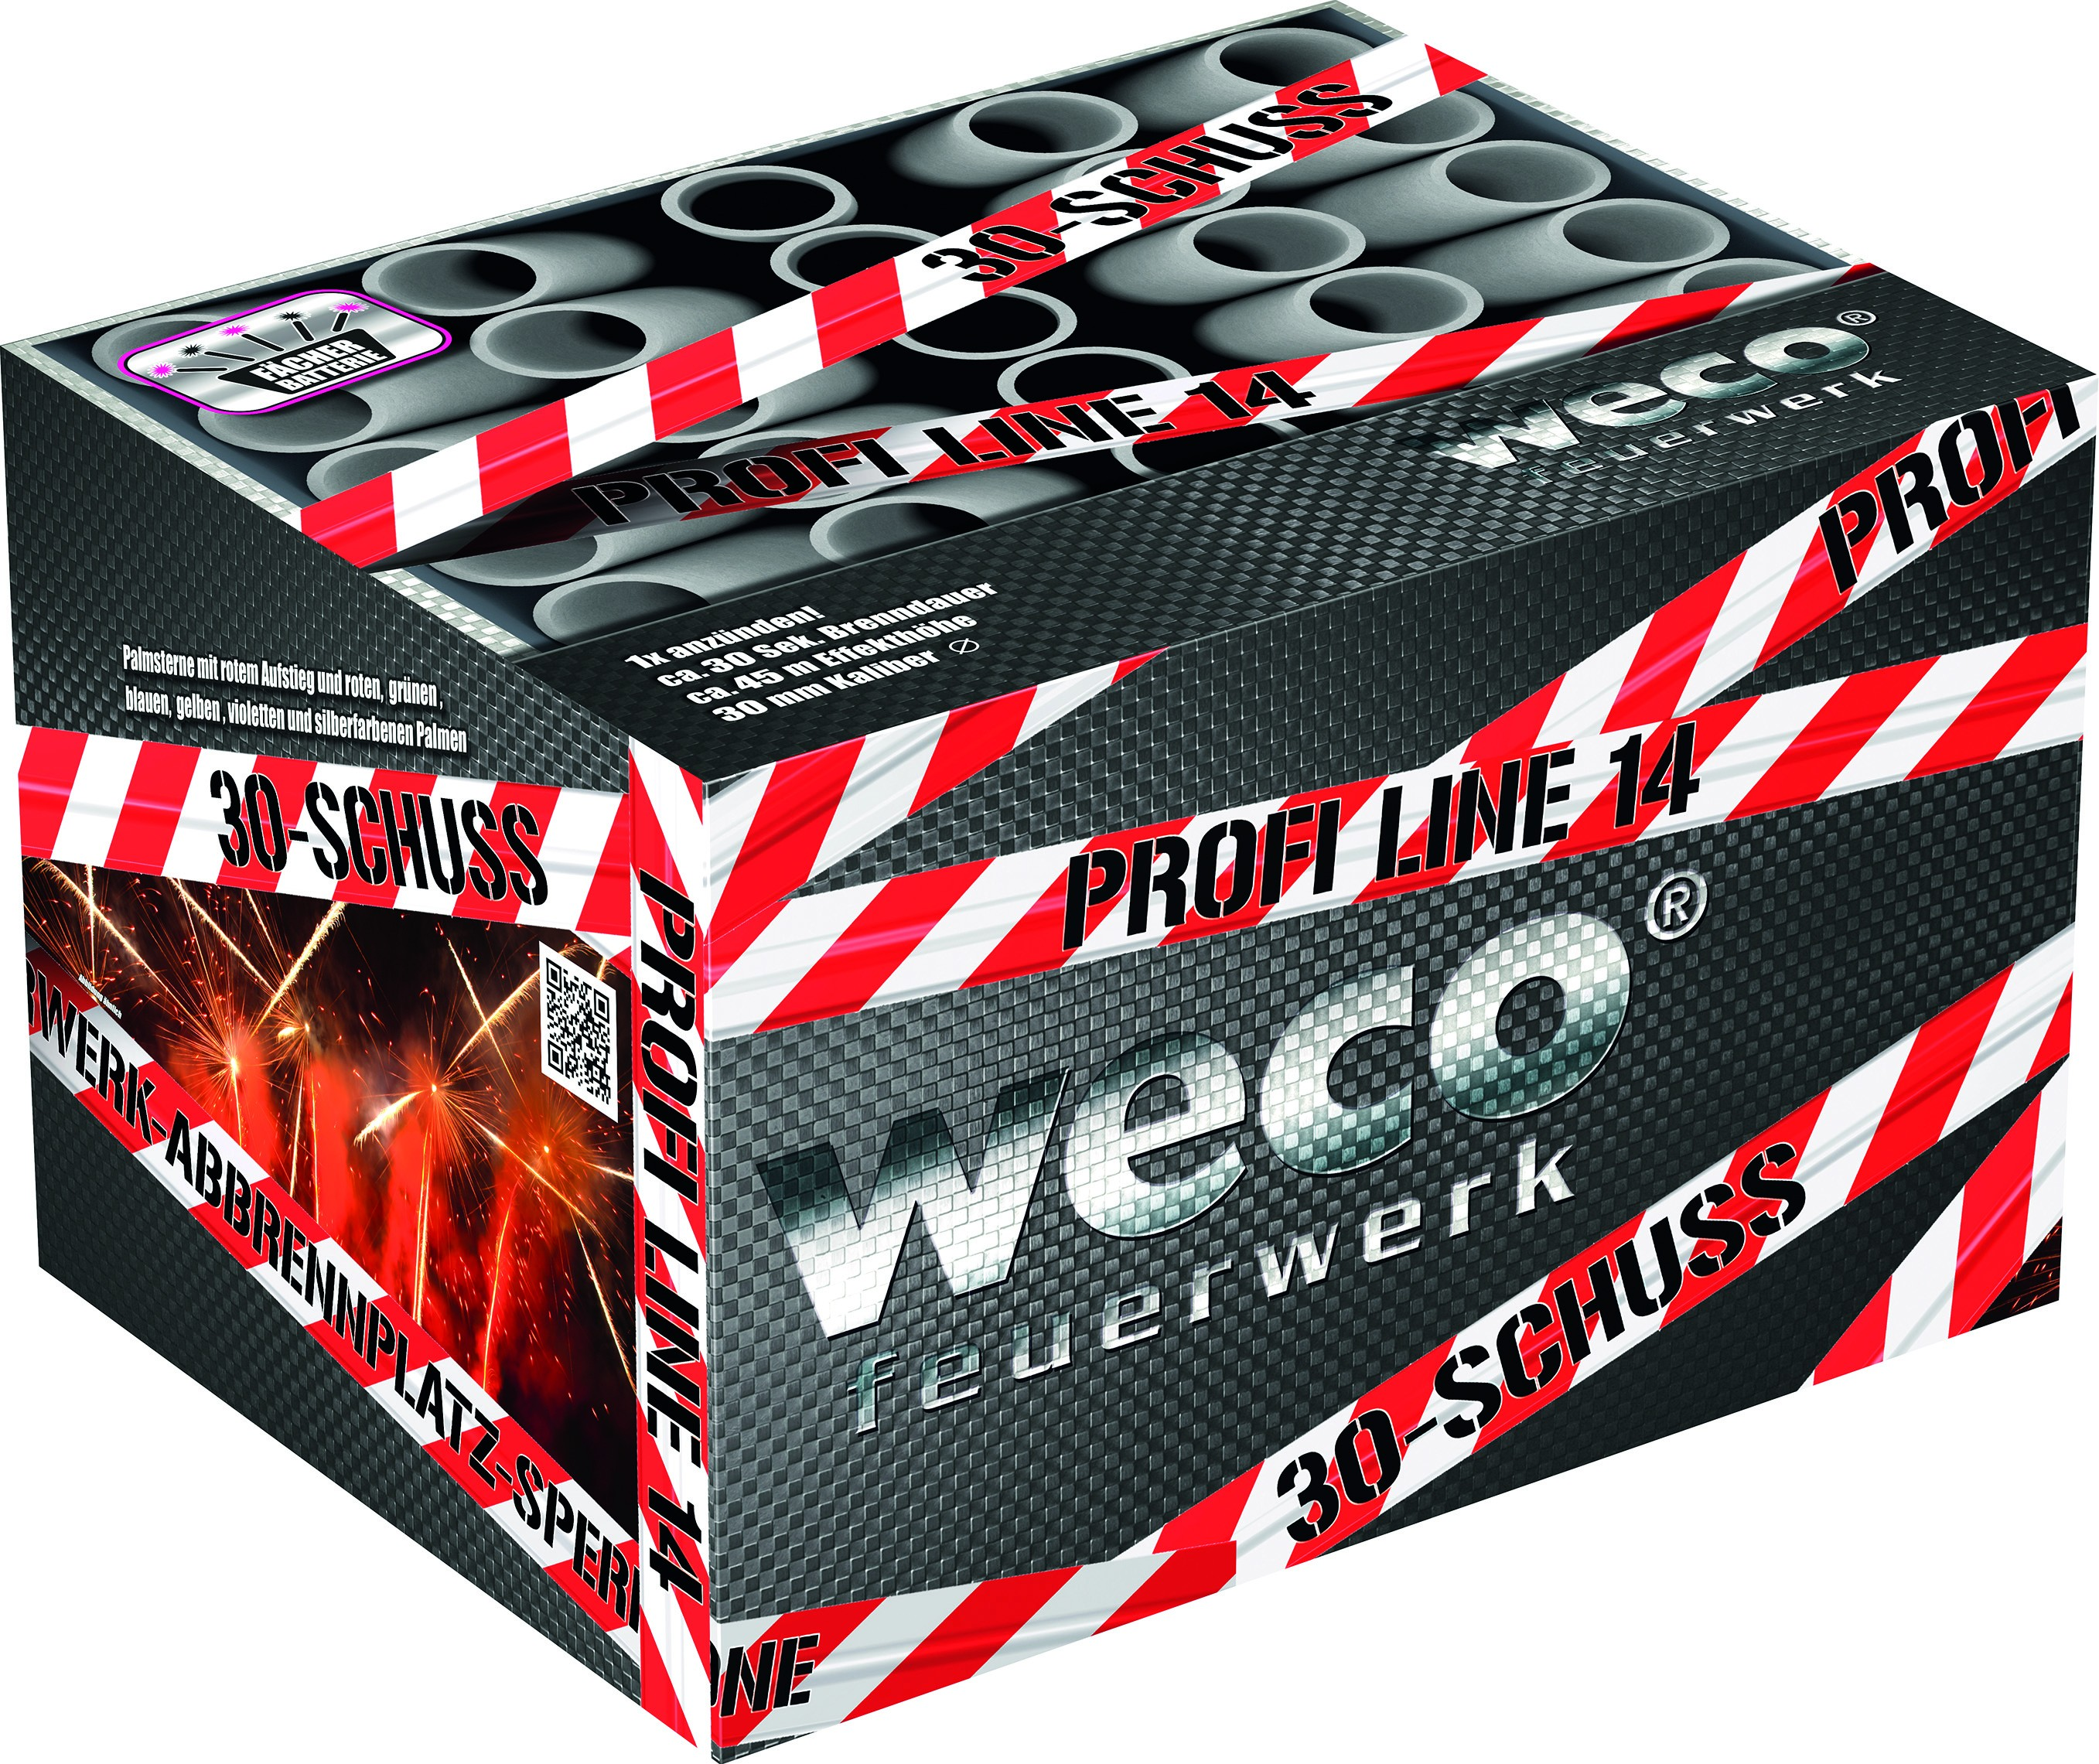 Weco Profi Line 14